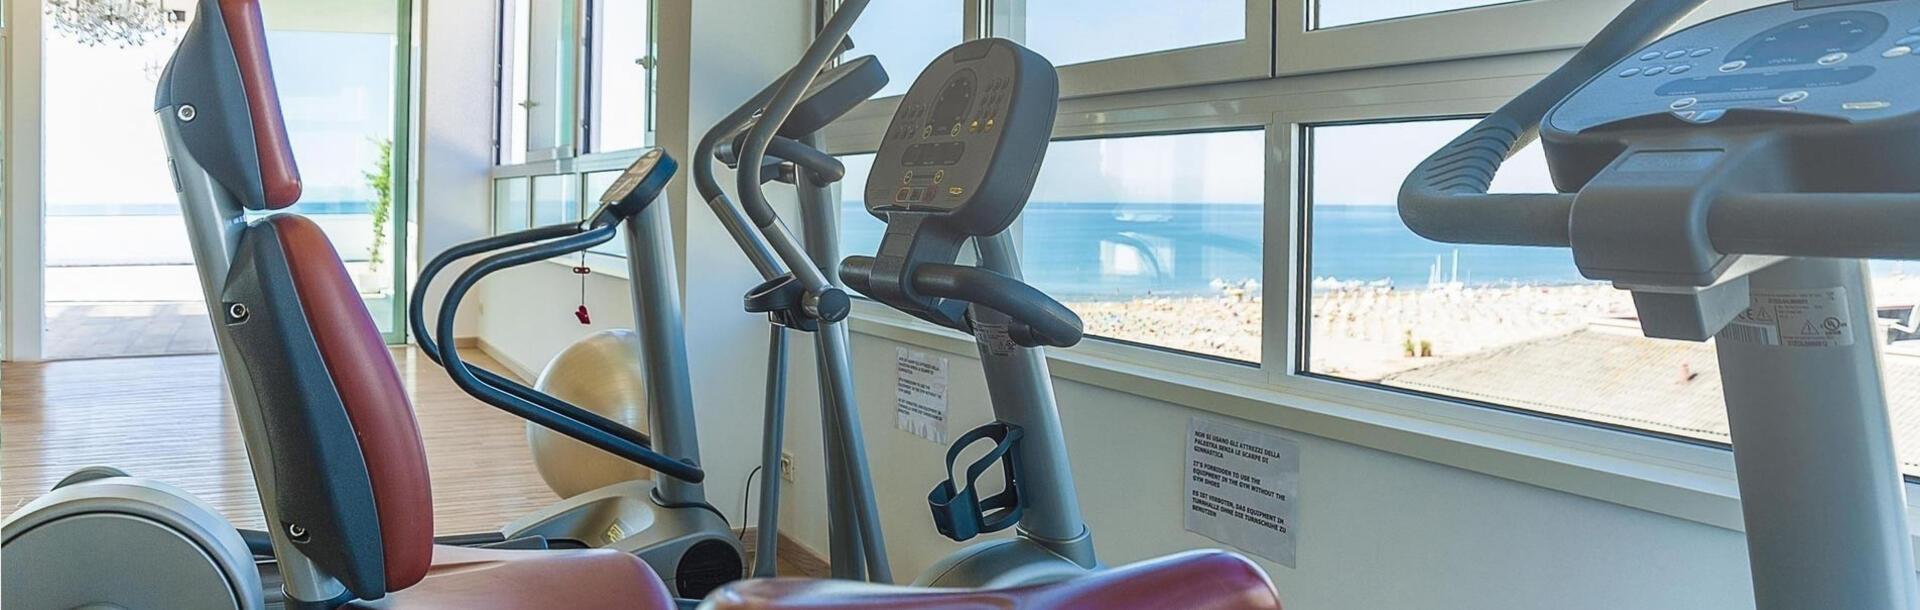 hotel-montecarlo pl silownia-sportowe-wakacje 013